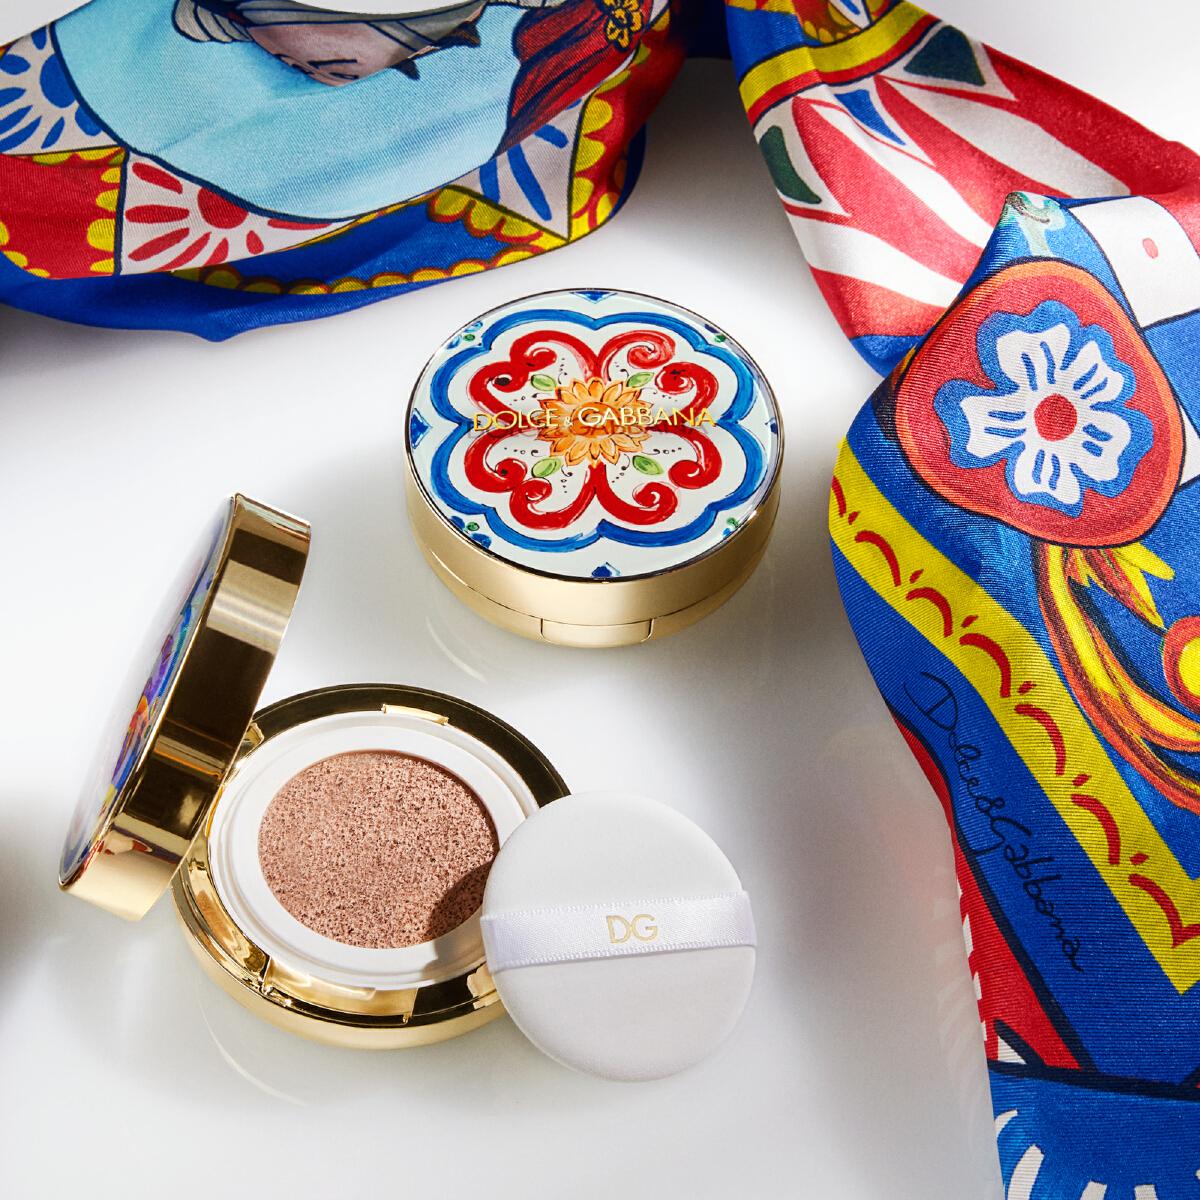 Dolce&Gabbana Solar Glow Healthy Glow Cushion Foundation SPF50 PA +++